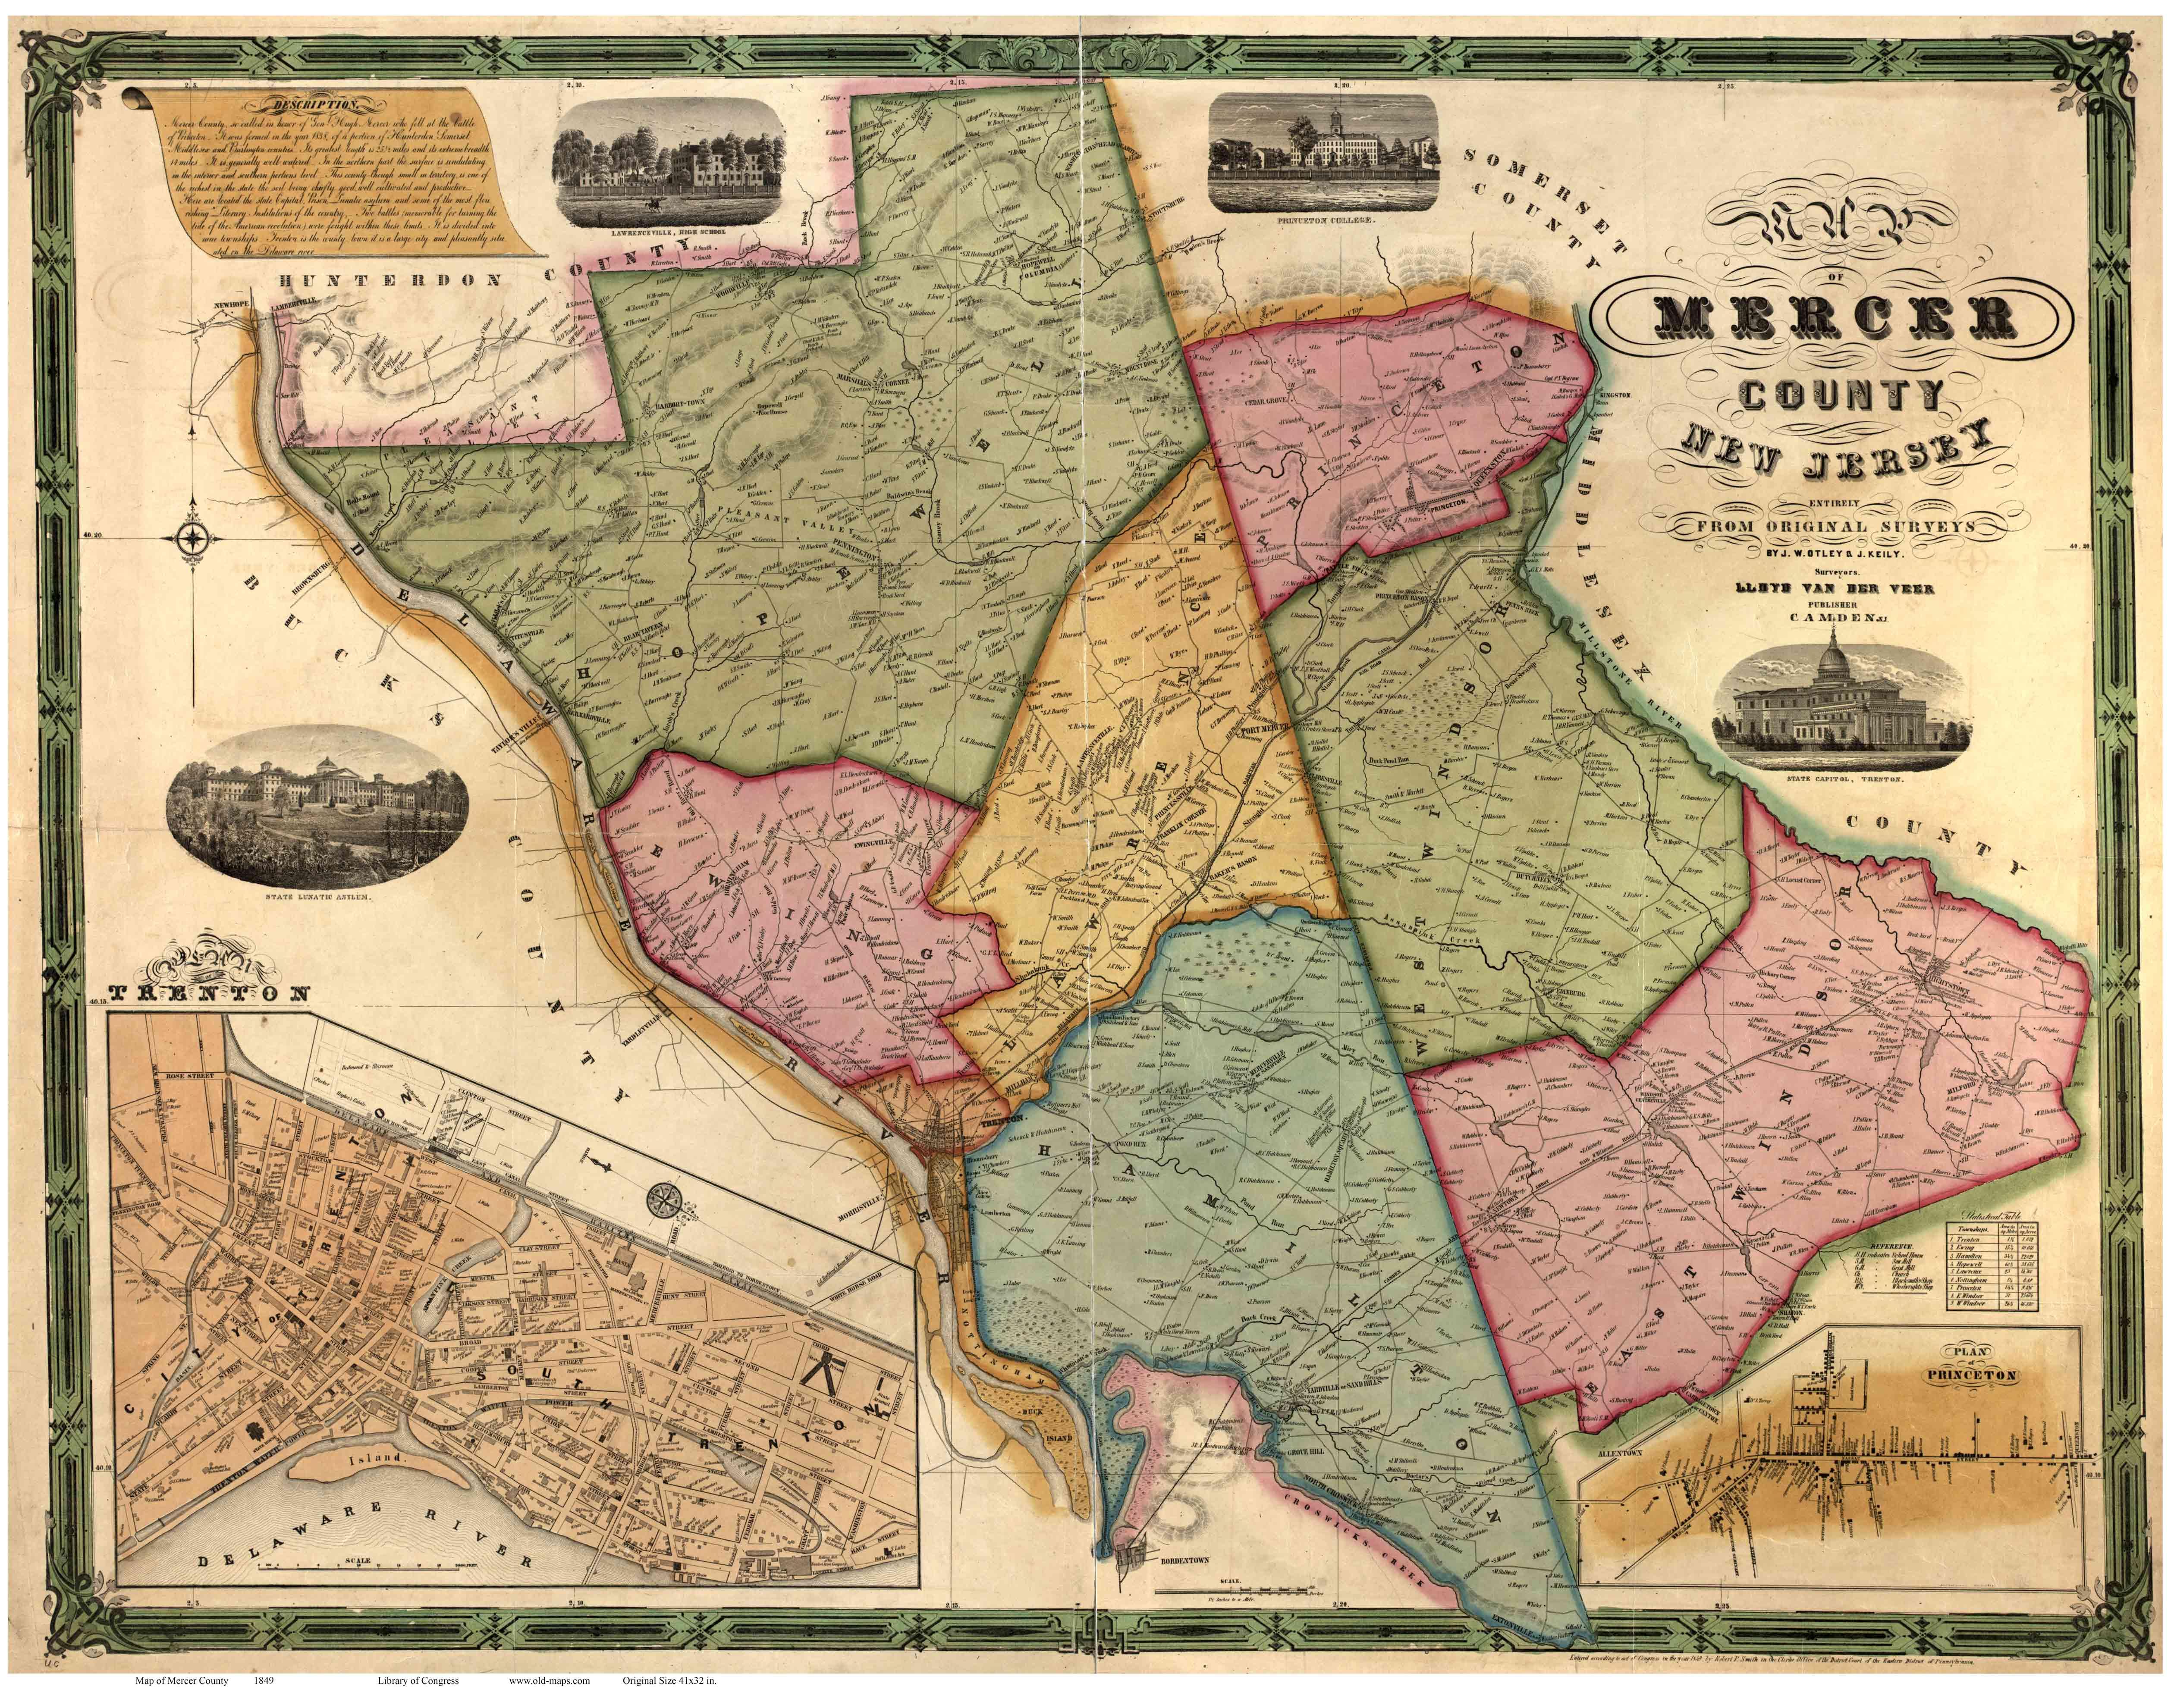 MercerCo NJ Wall Map